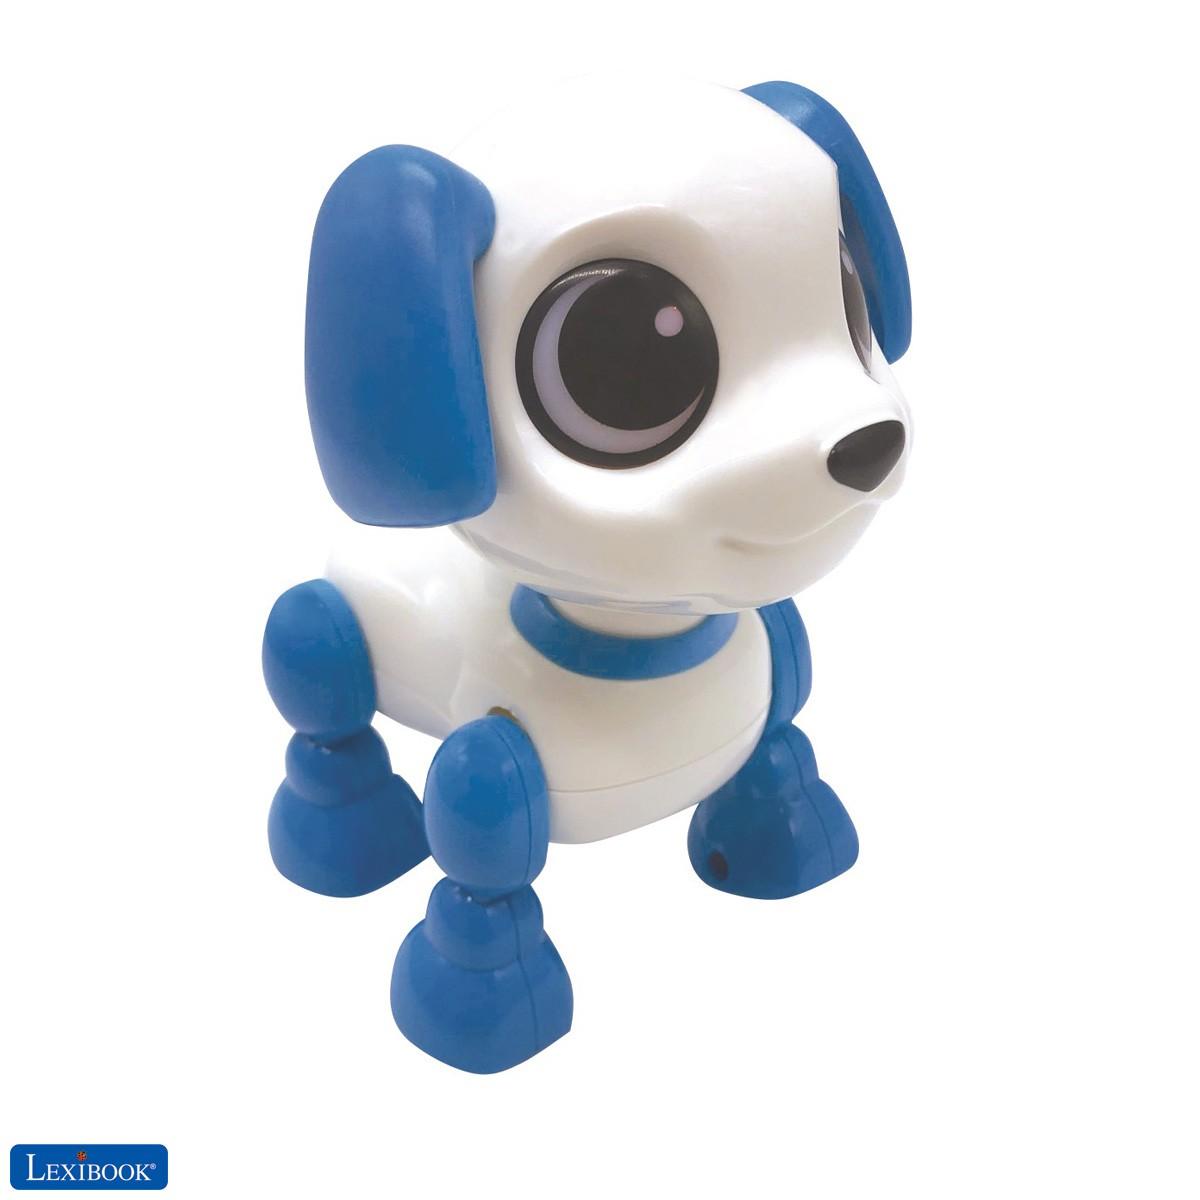 Power Puppy® Mini - My Little Robot Dog